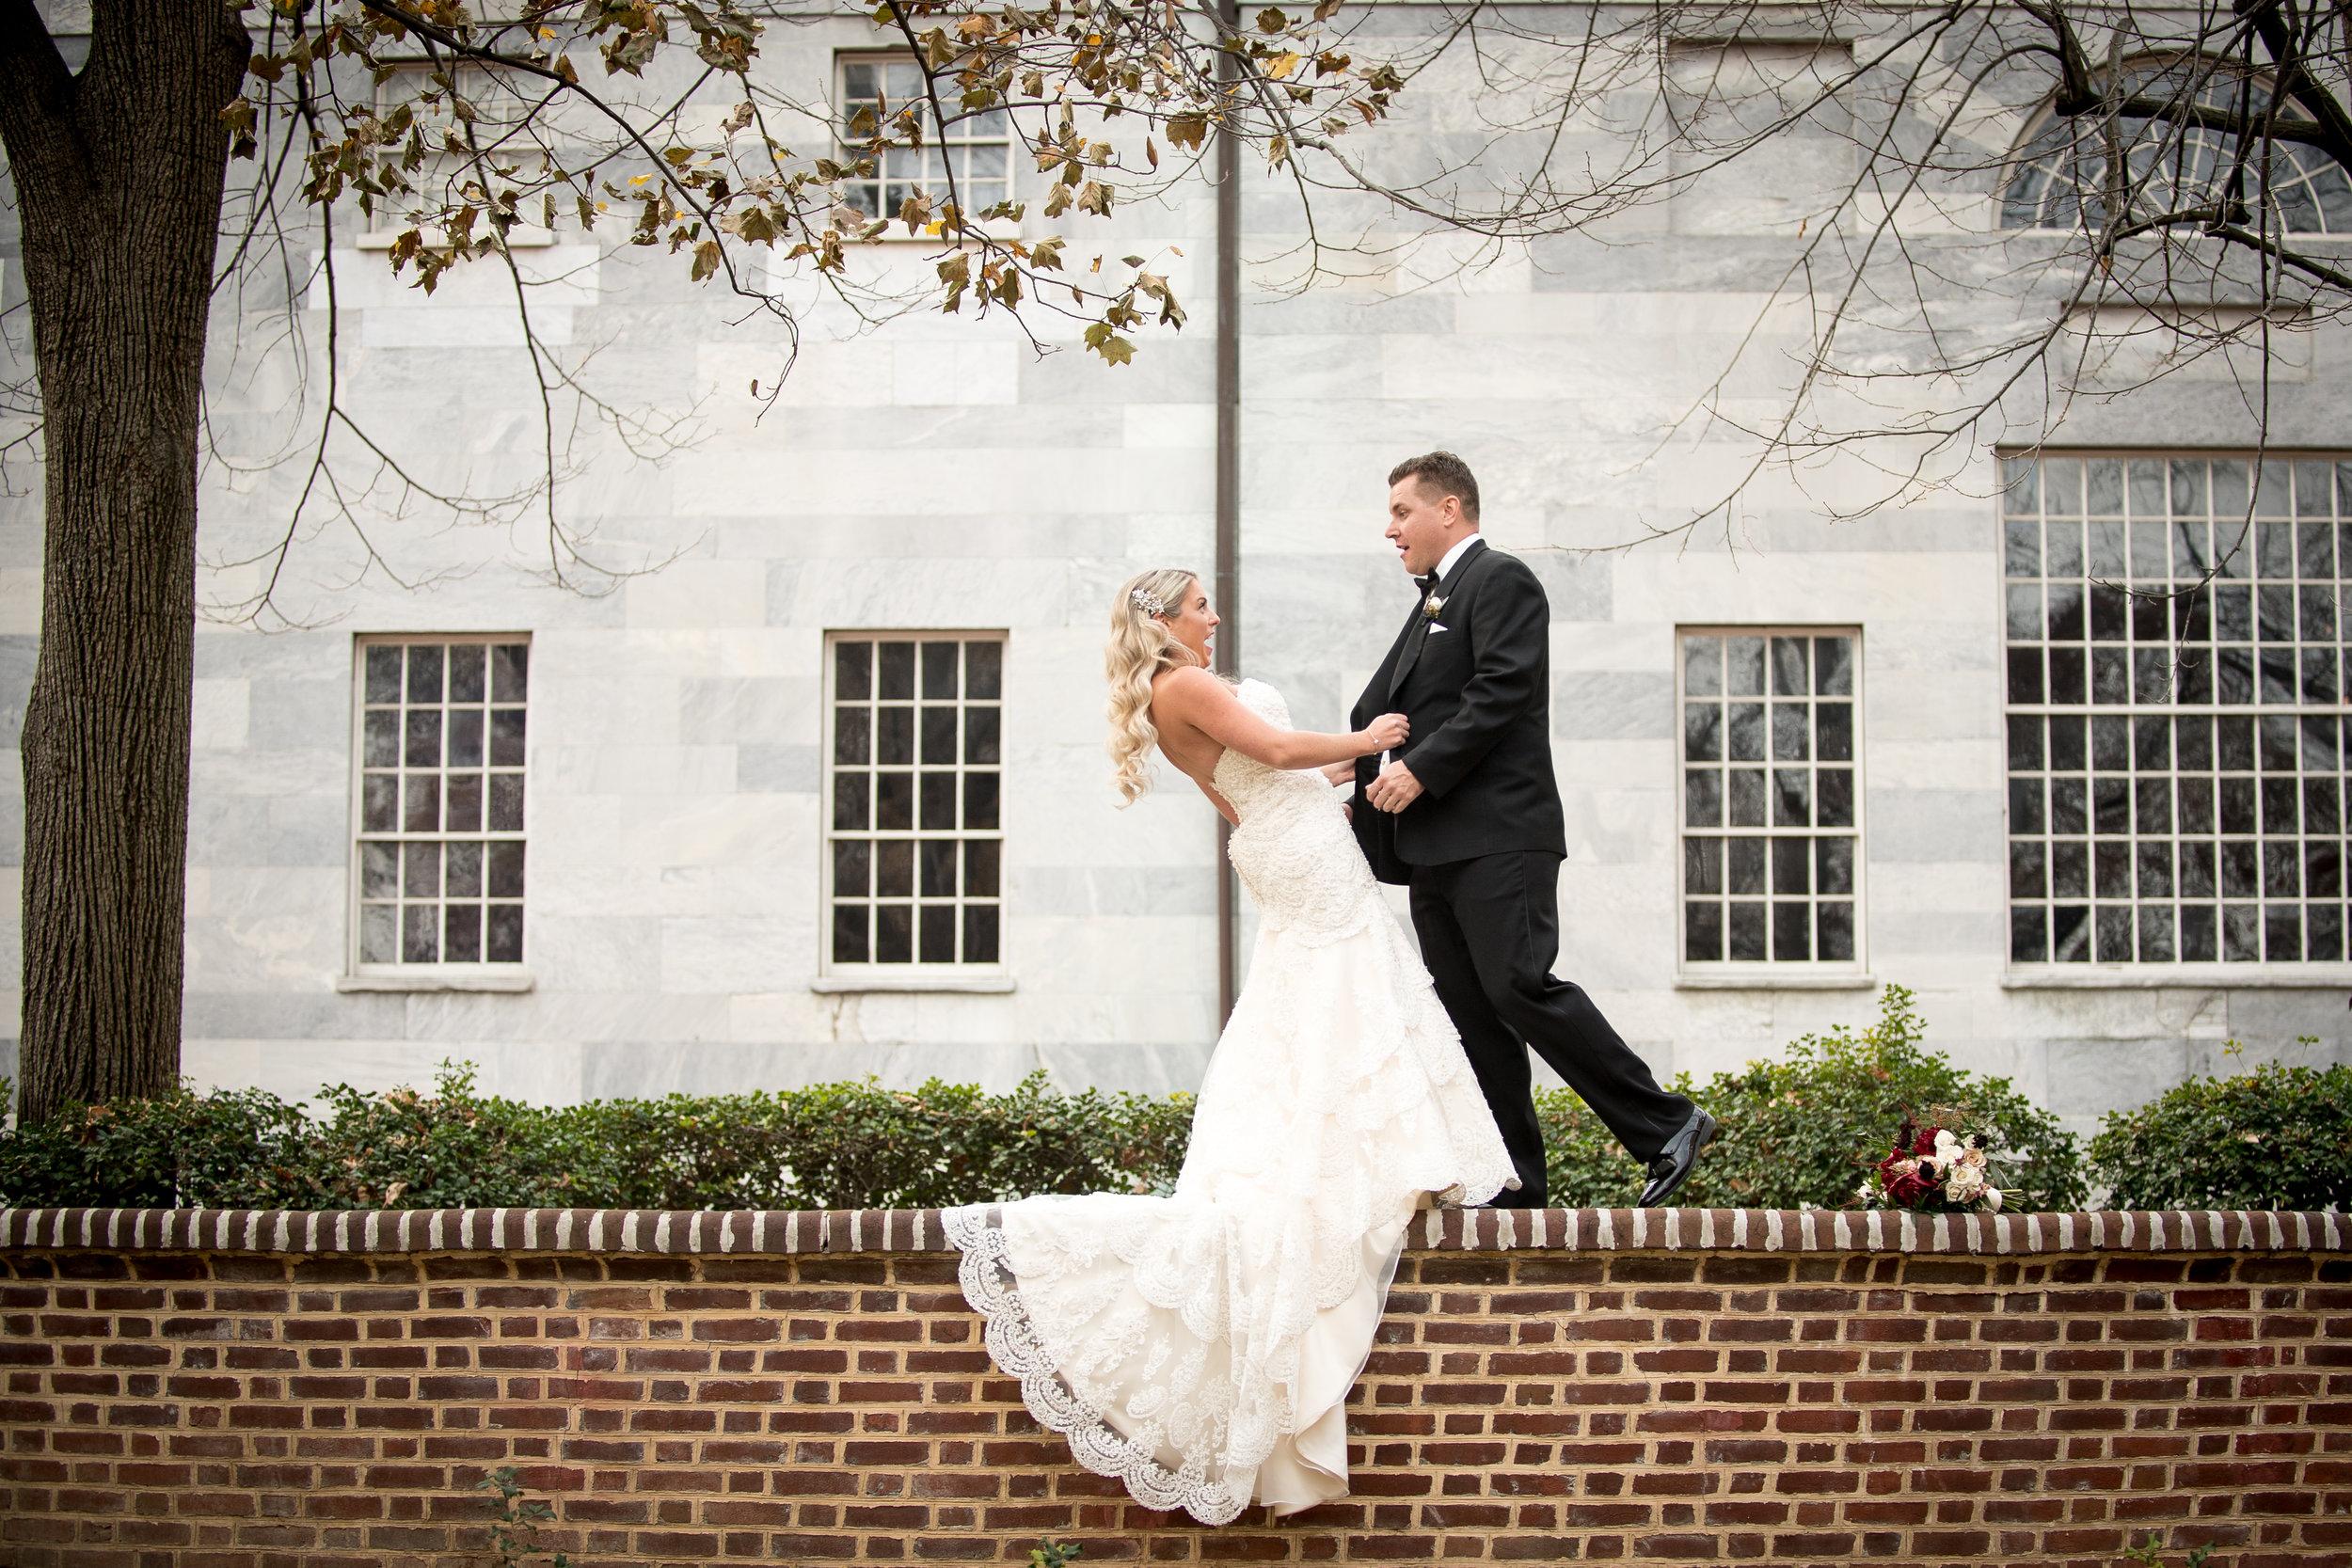 curtis-atrium-wedding-philadelphia-christine-charles-22.jpg